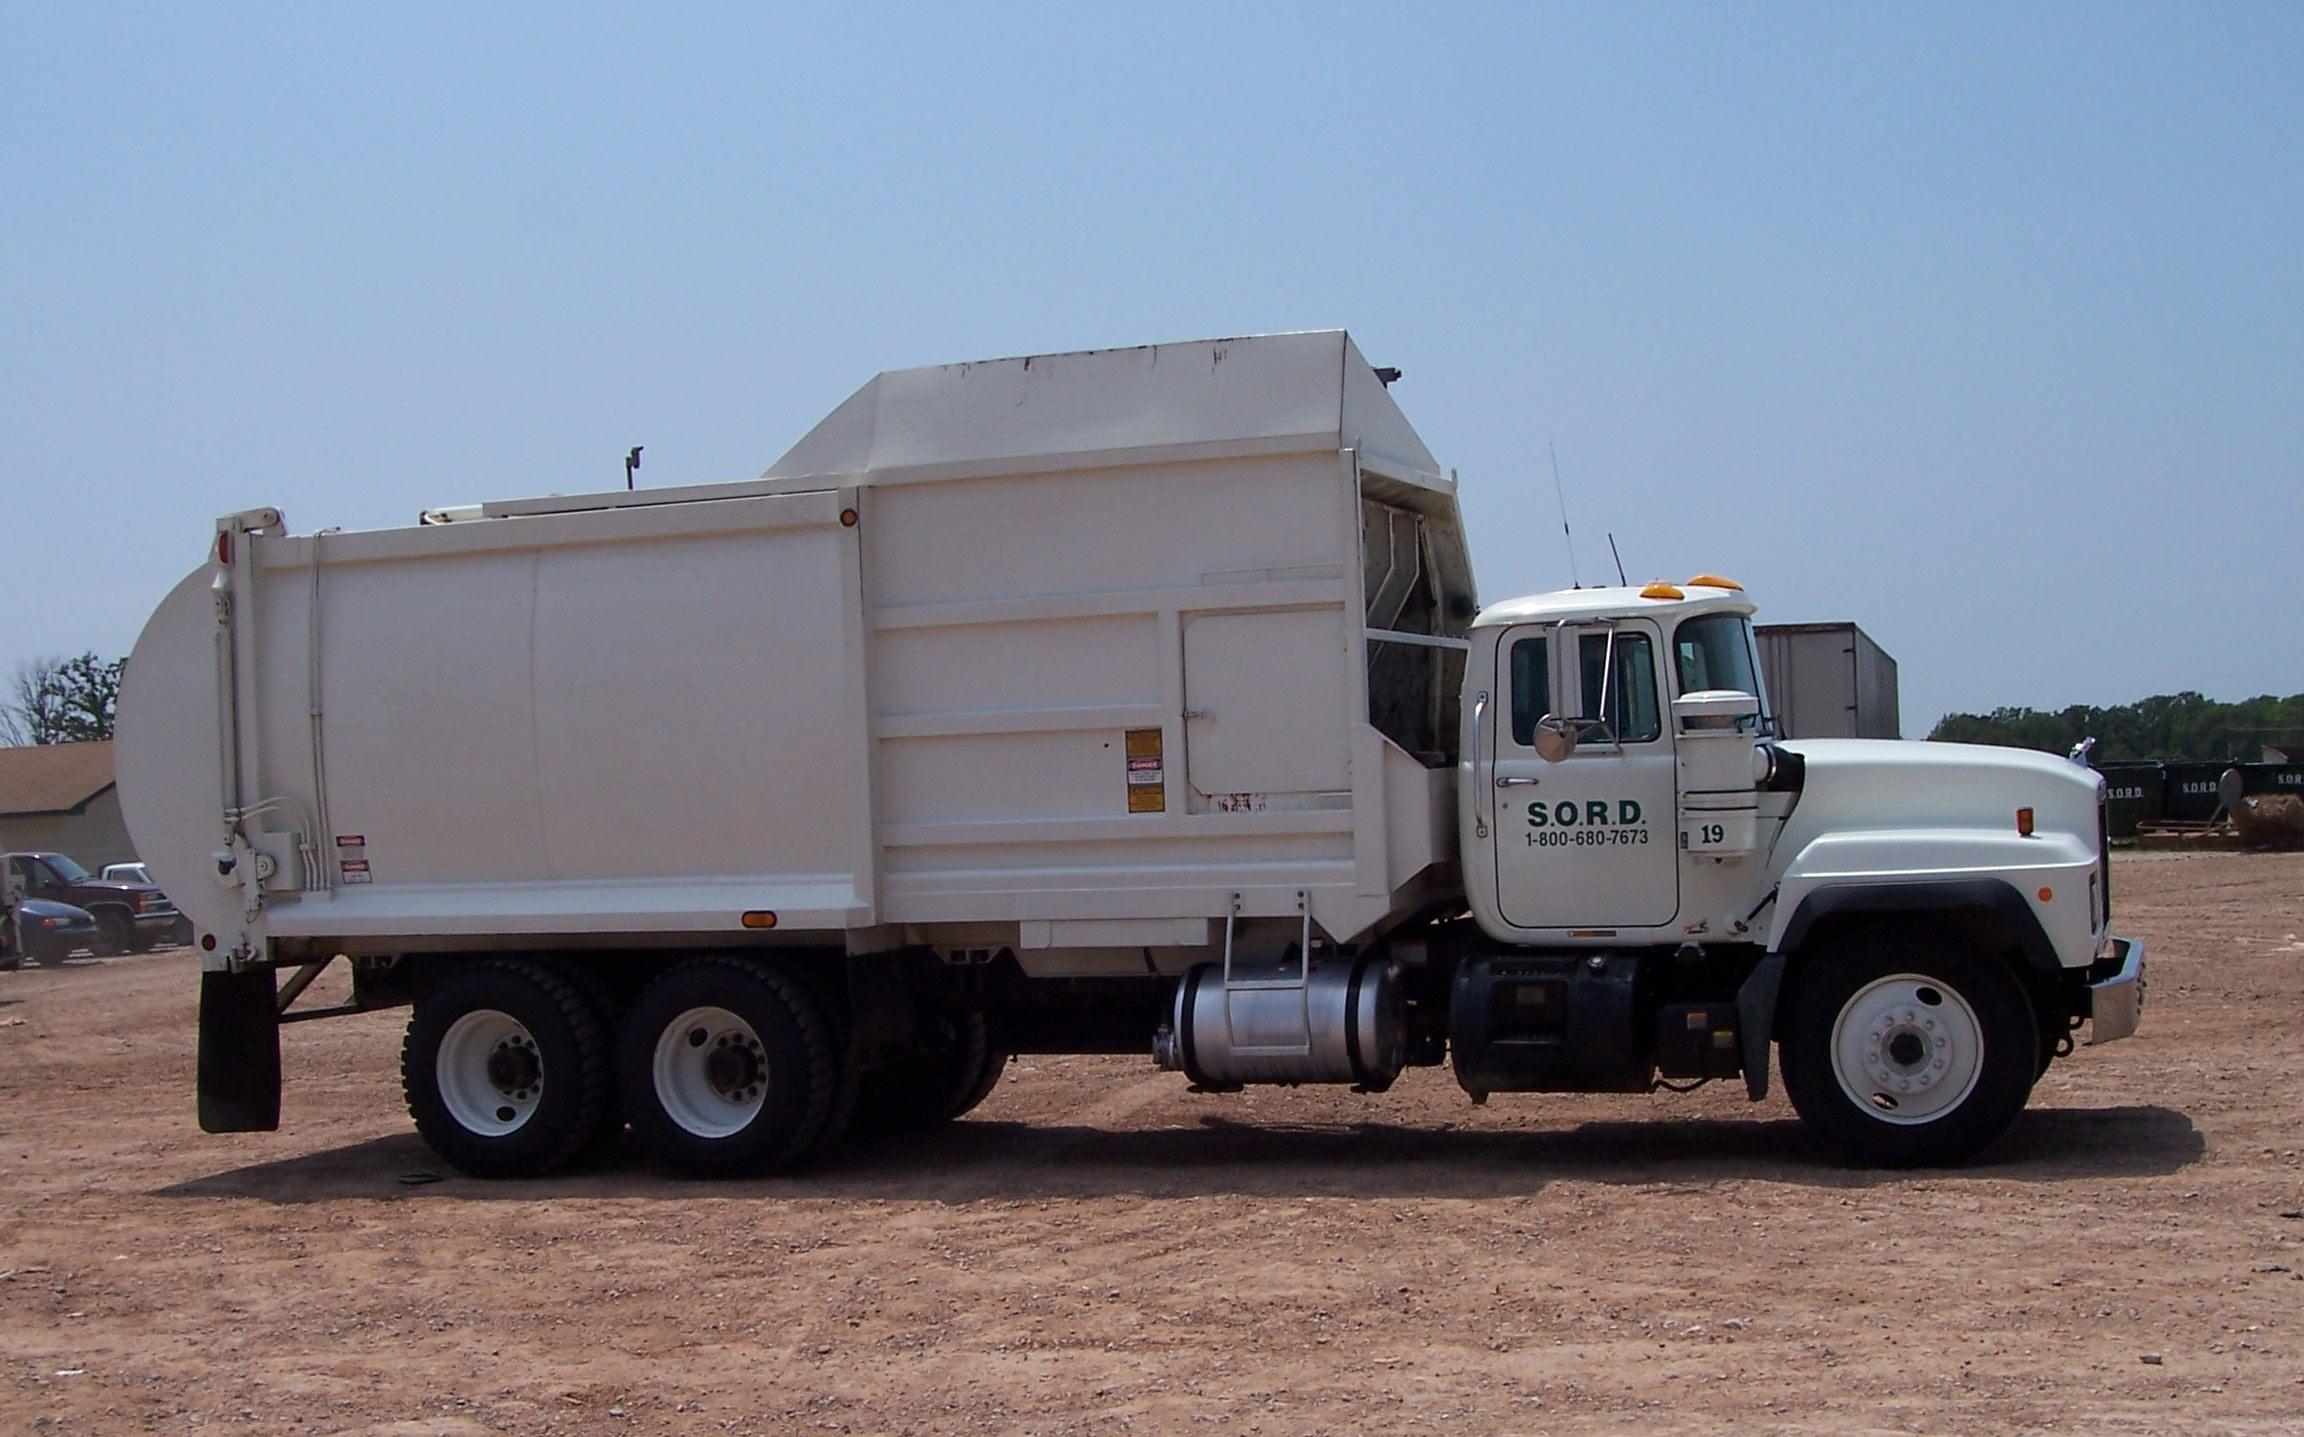 Southern Oklahoma Regional Disposal Service image 0